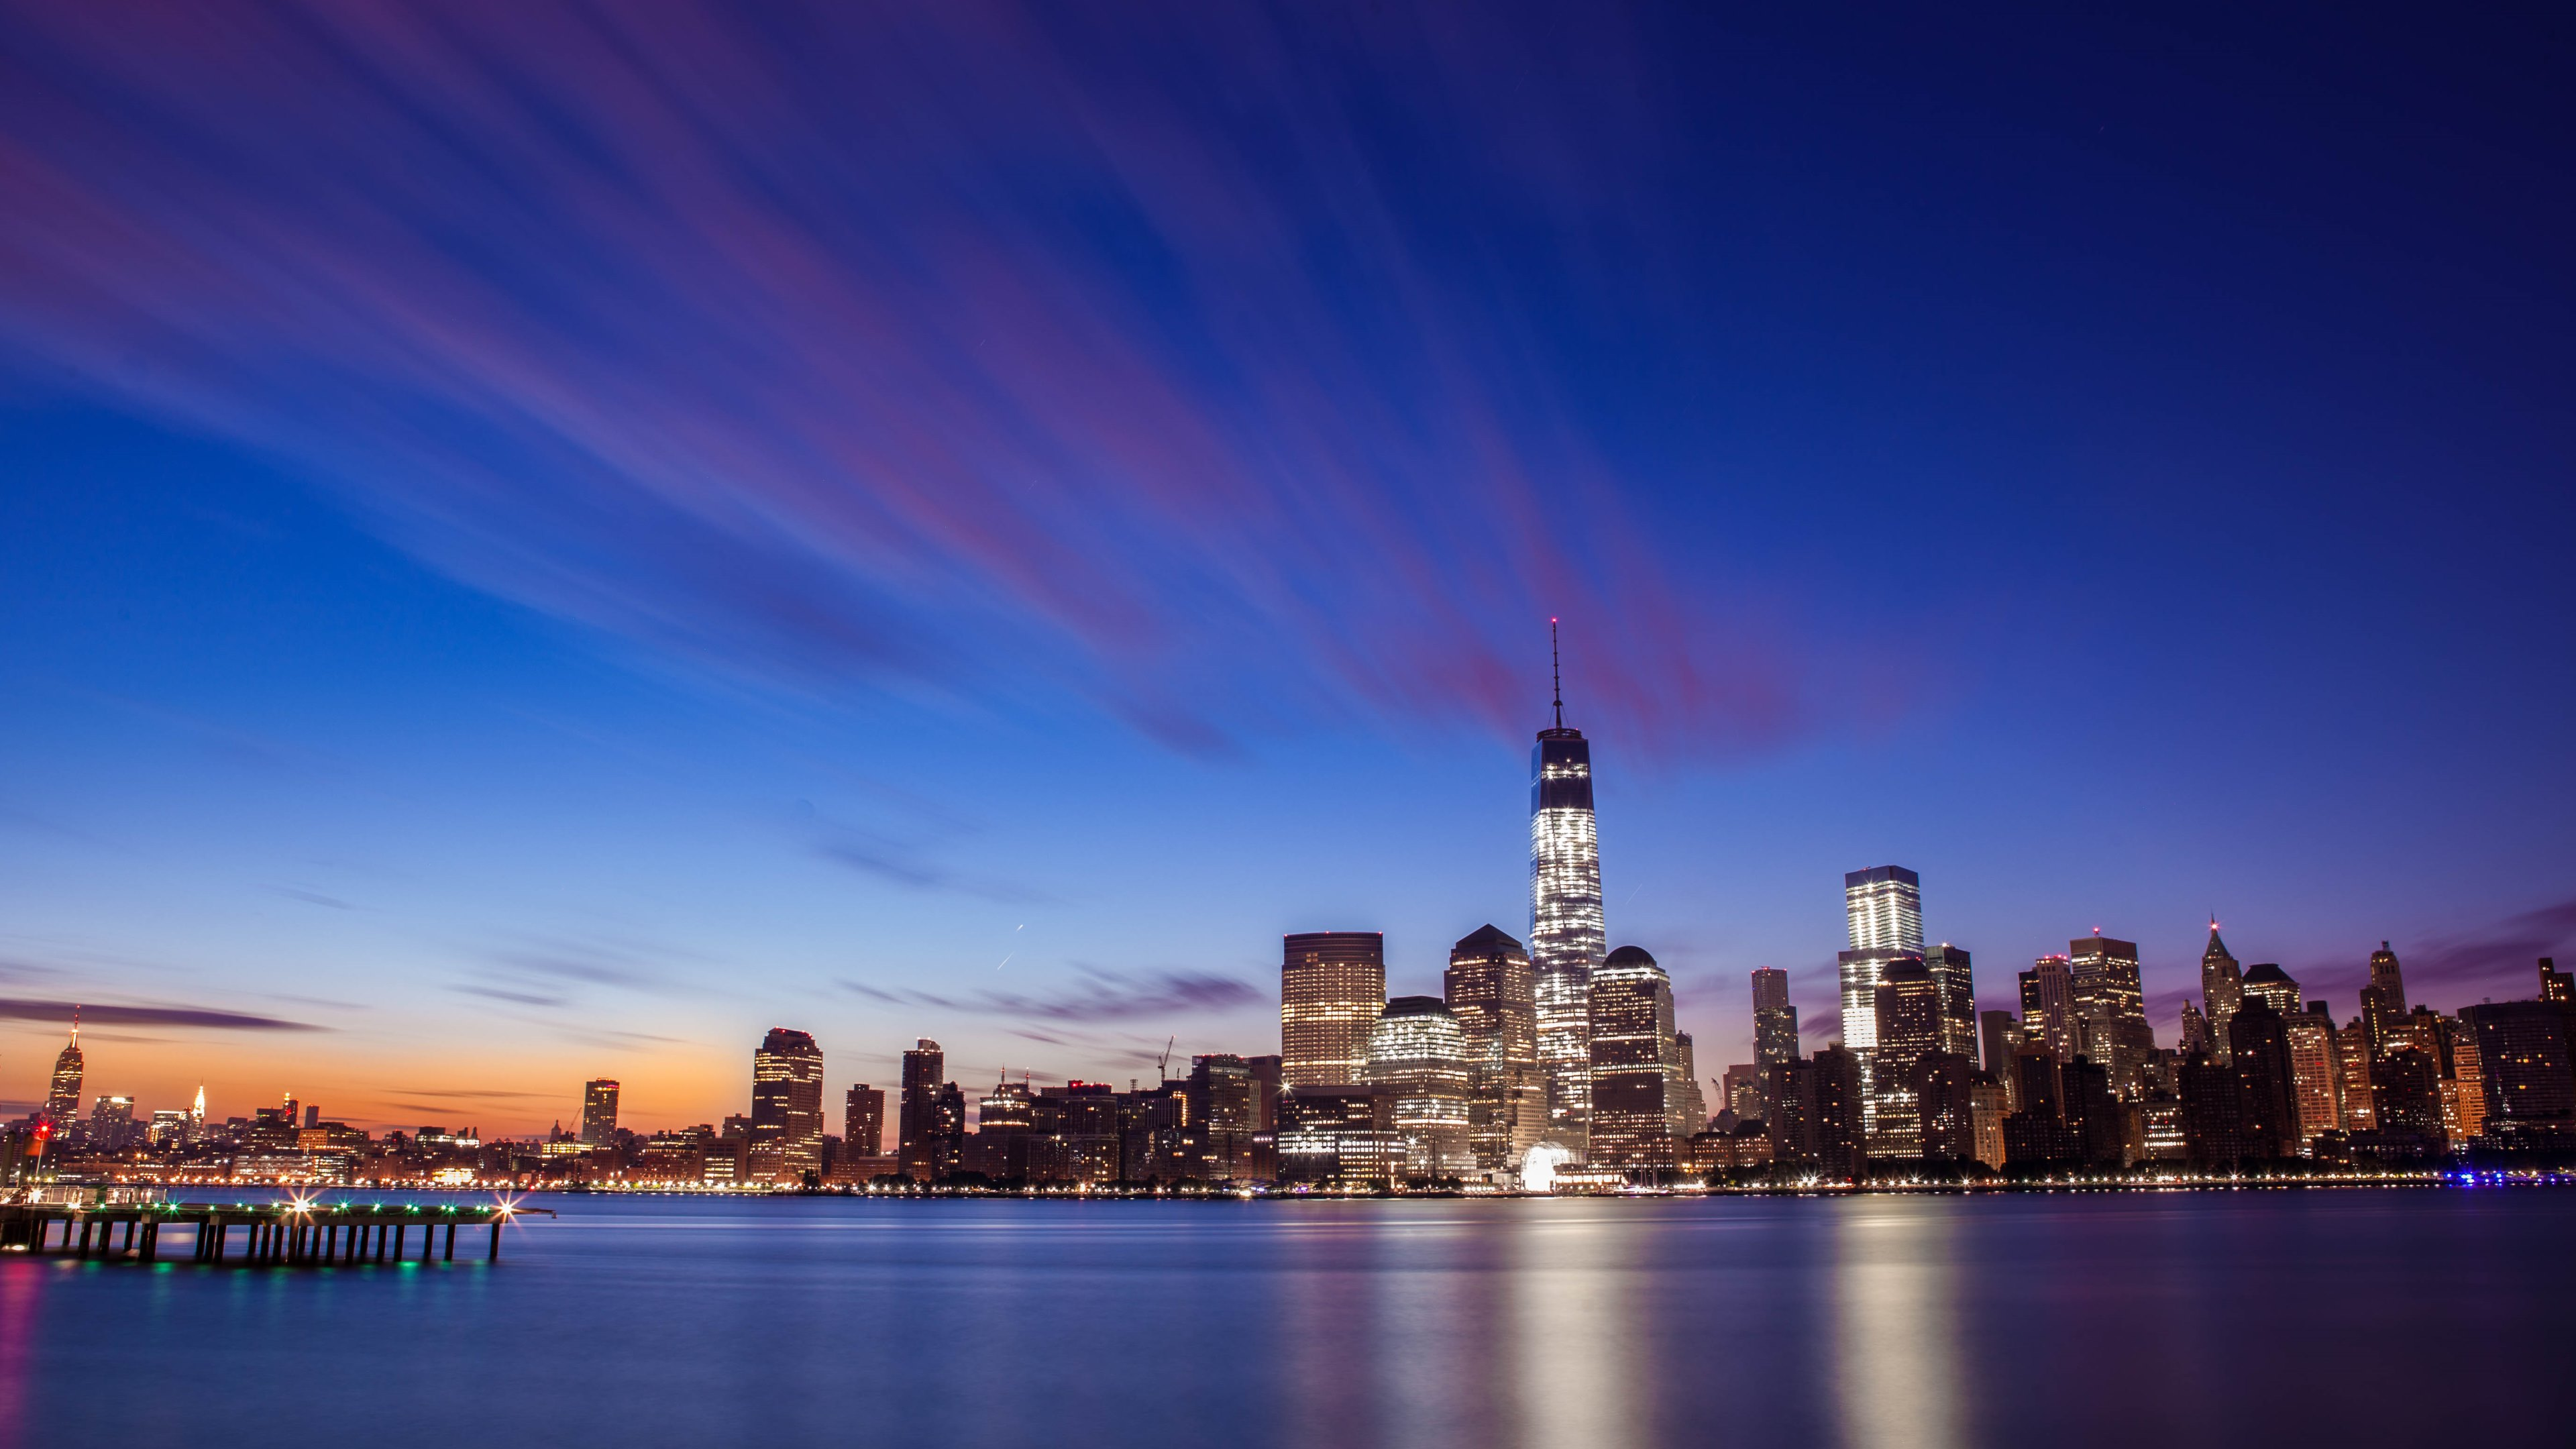 New York City Skyline Wallpaper 4K Wide Screen Wallpaper 1080p2K4K 3840x2160